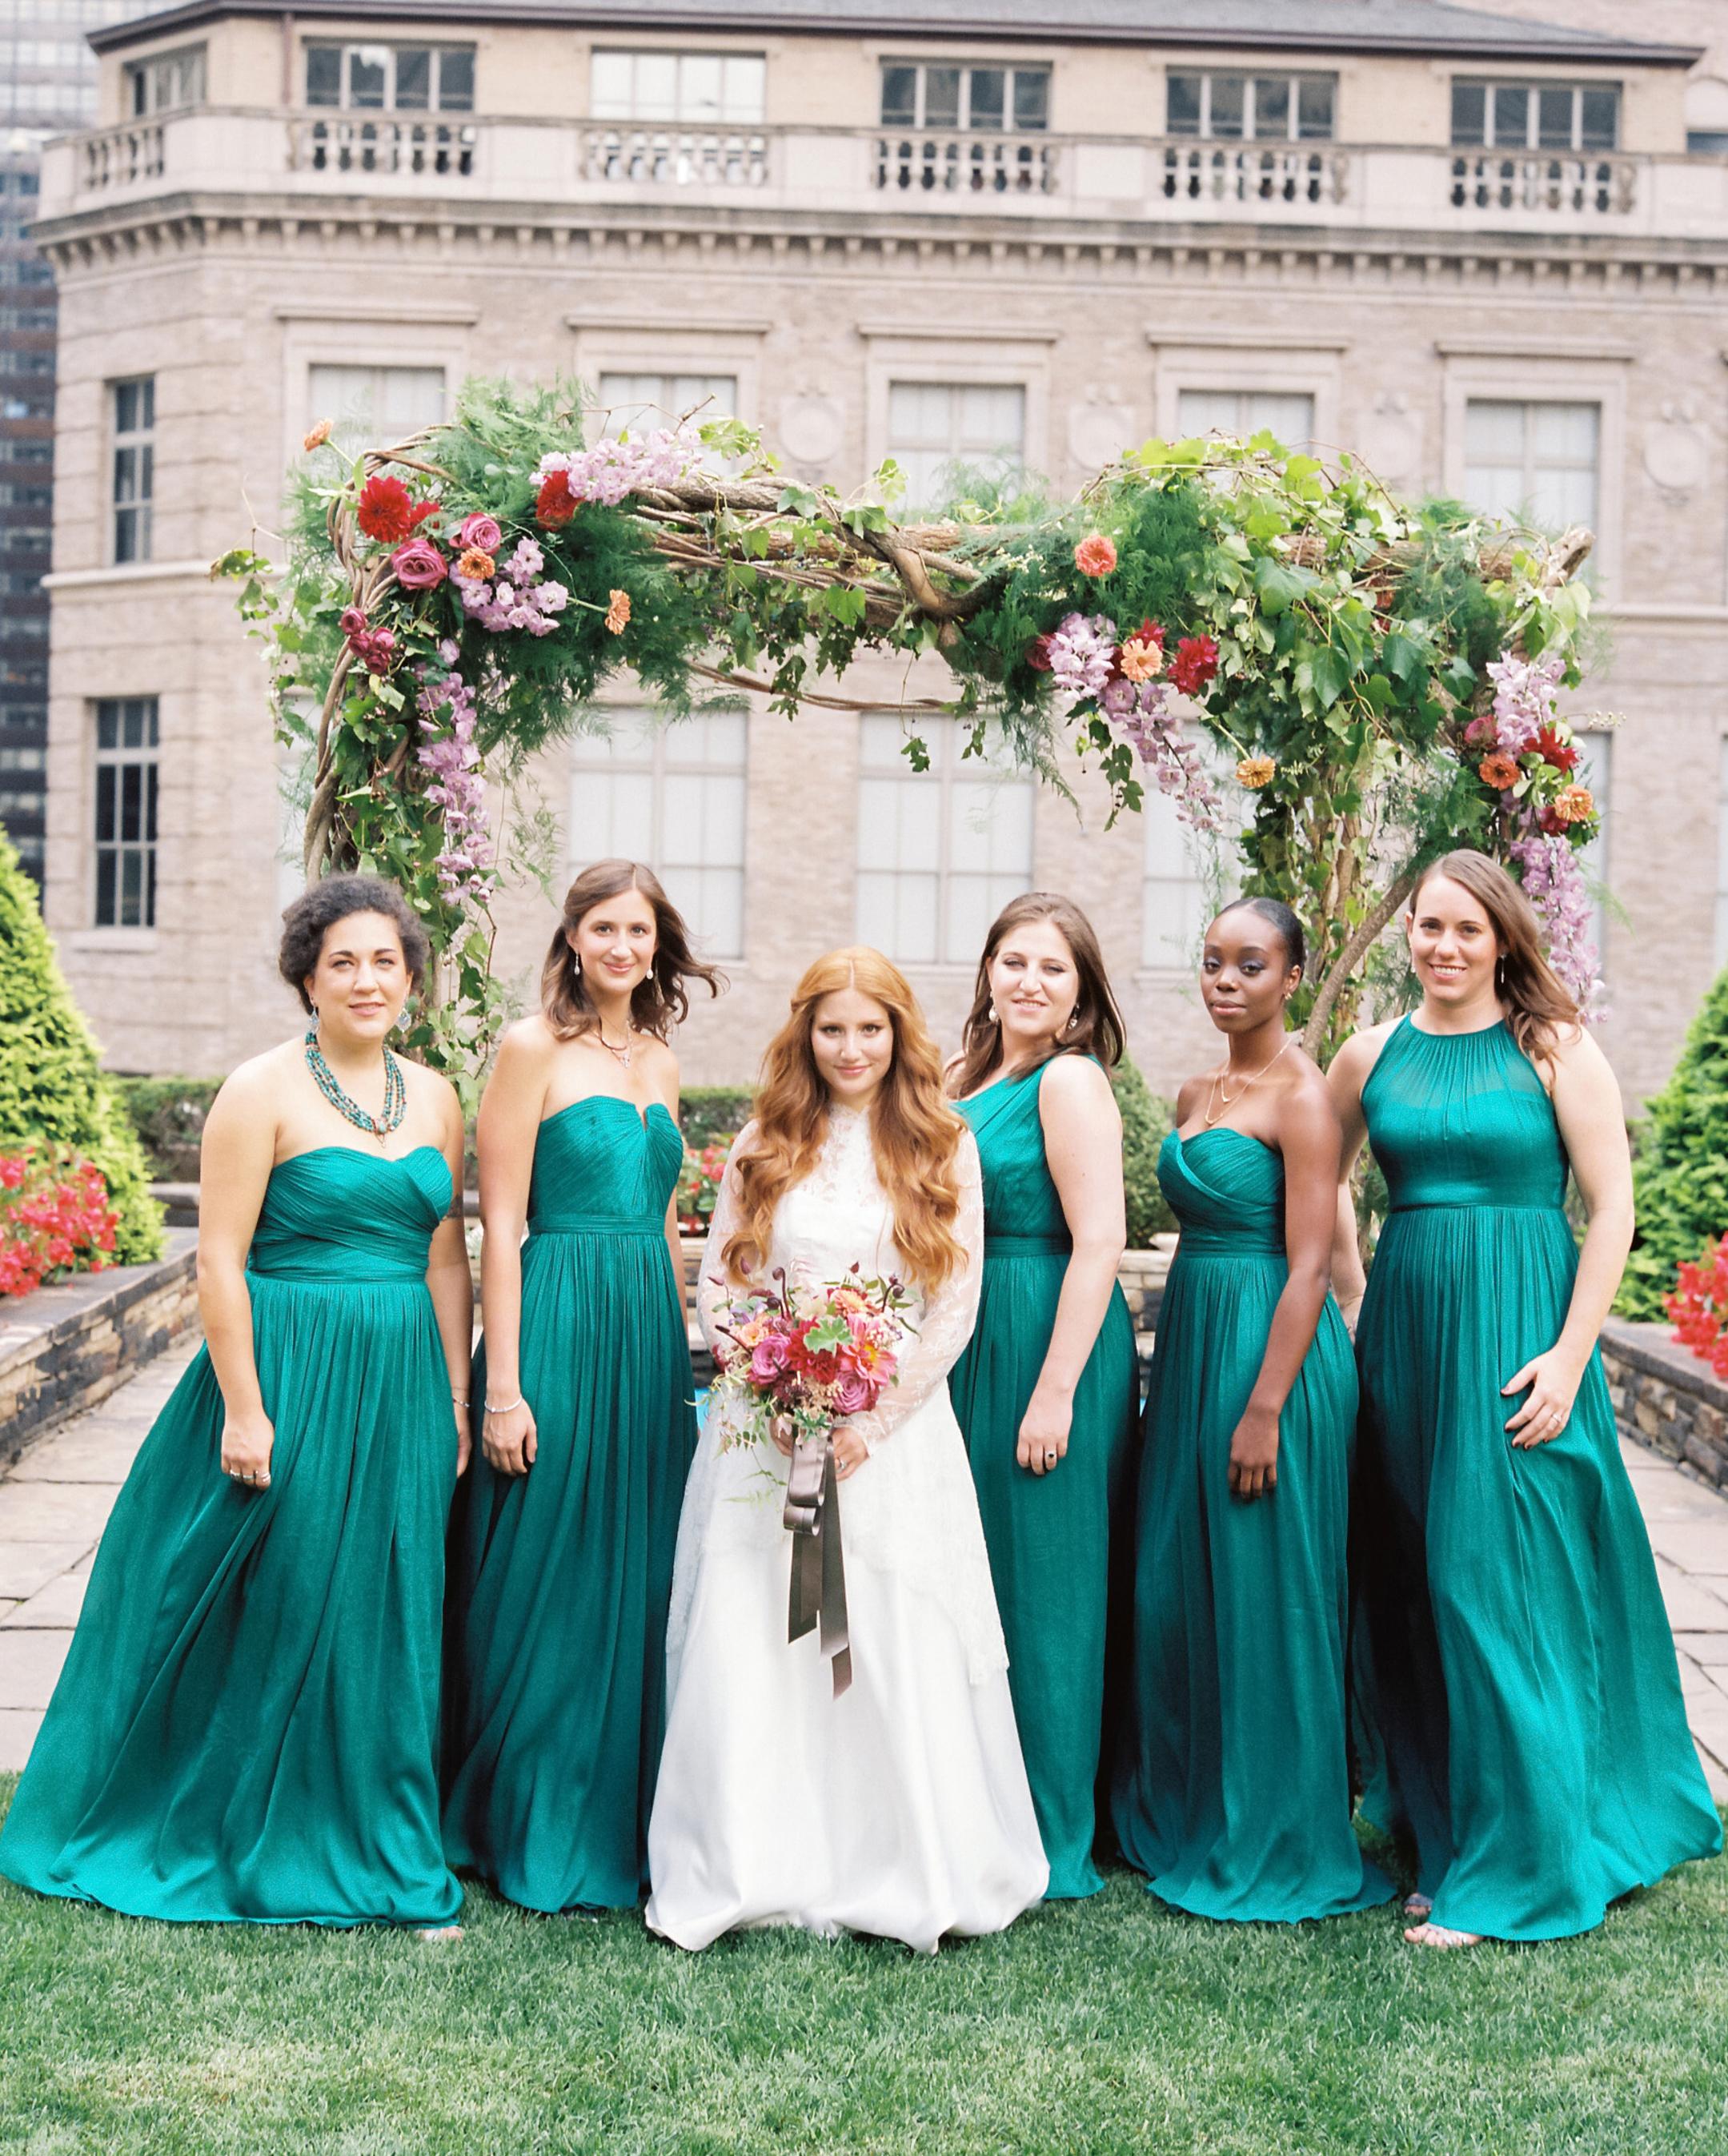 lilly-sean-wedding-bridesmaids-00195-s112089-0815.jpg